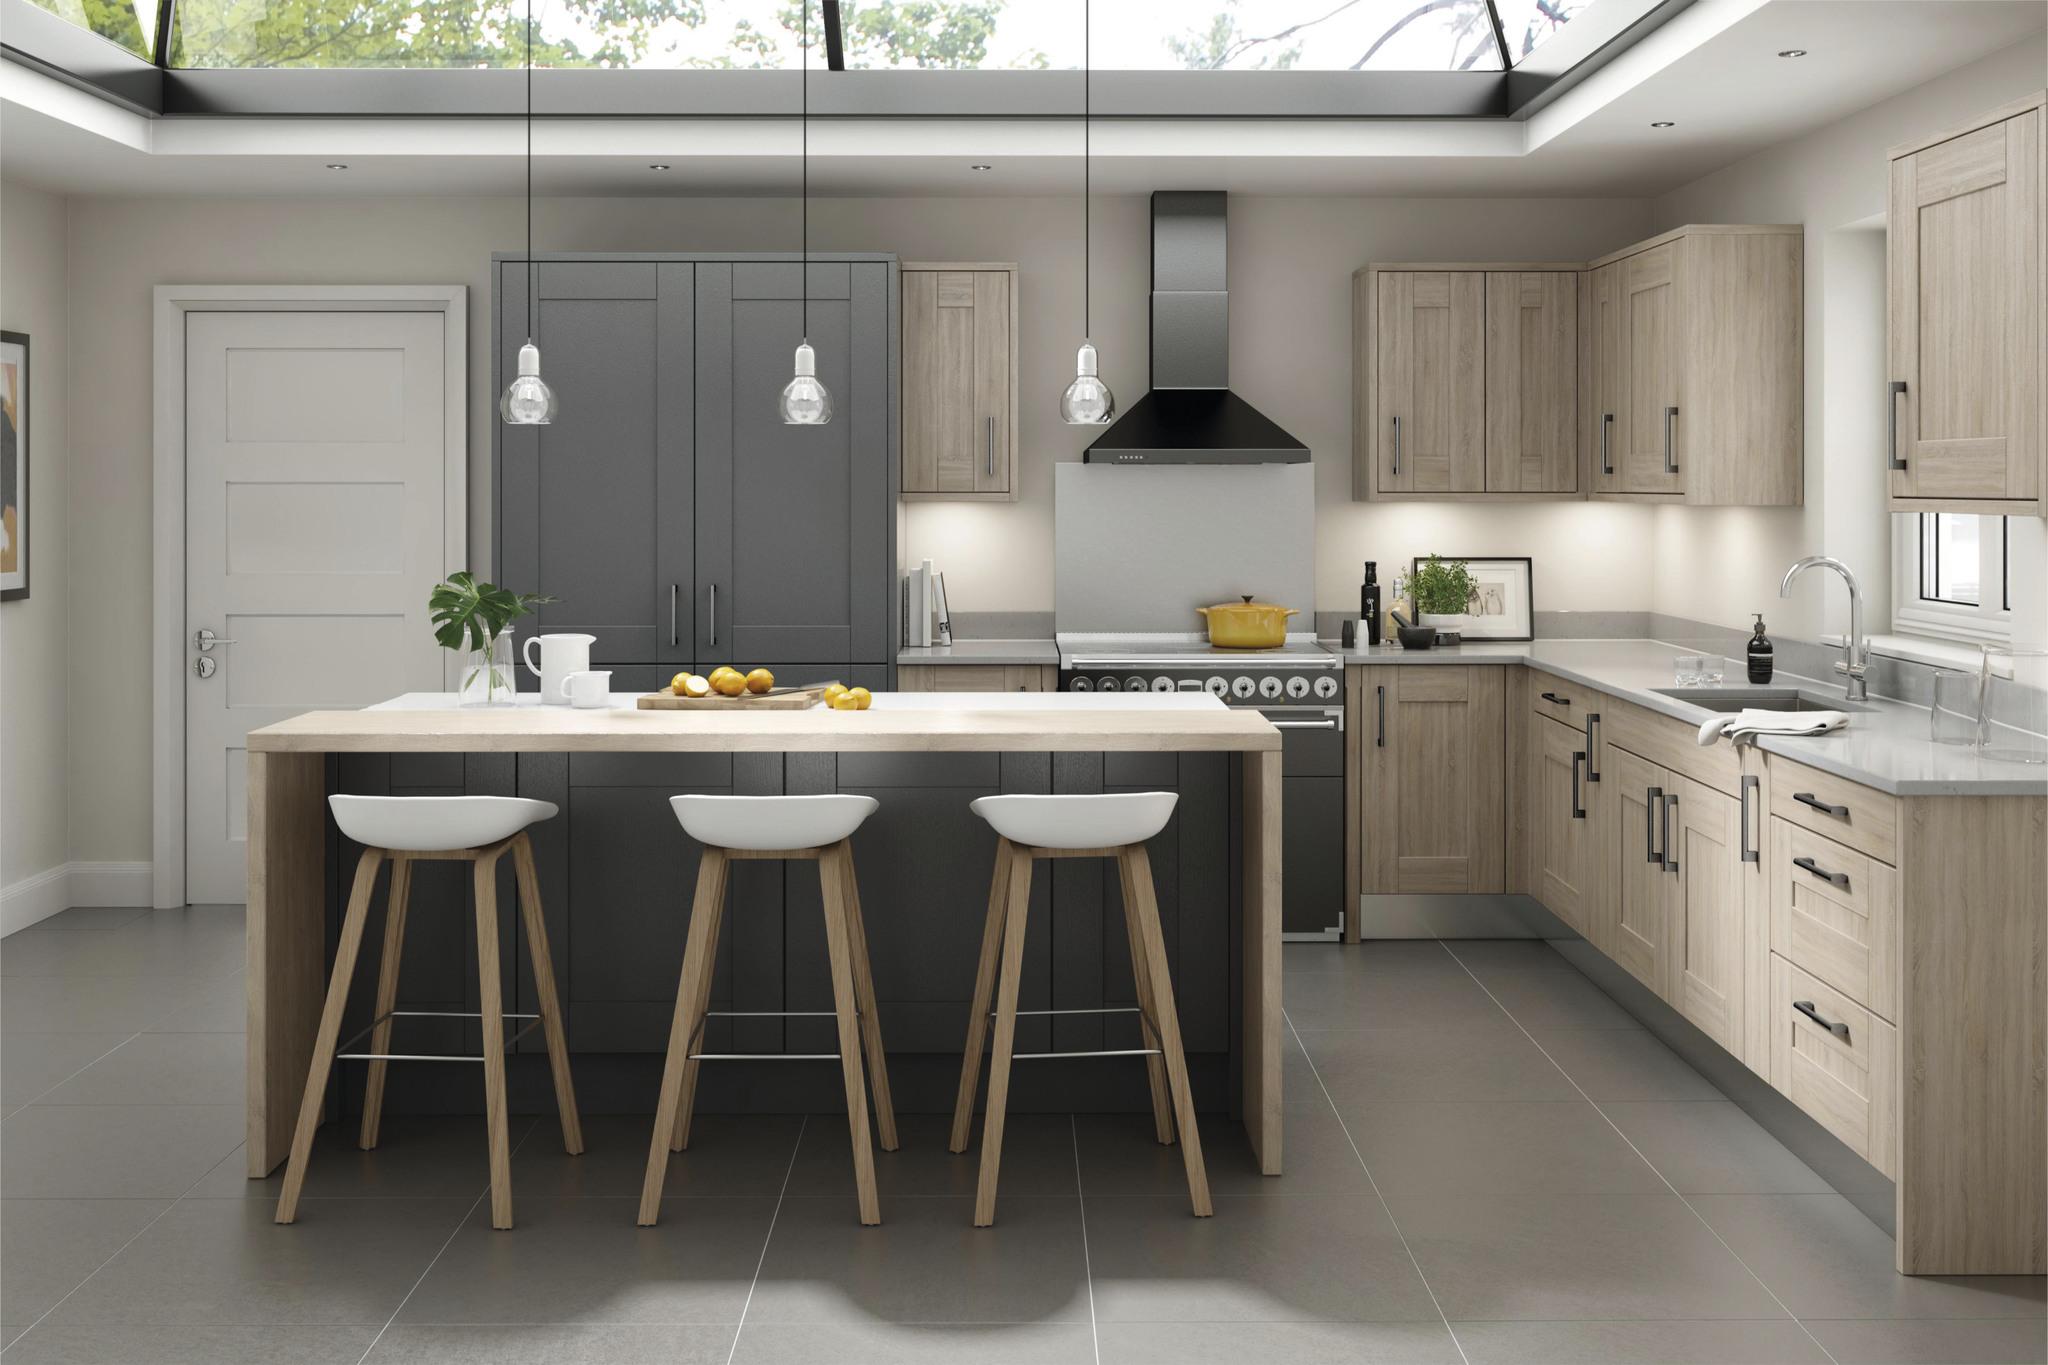 Milbourne £3611 - 7 colours from standardFree Neff oven, hob ,hood, Dishwasher+Granite quartz £2900 + Installation £2500 =Total £9011   Free Consultation!